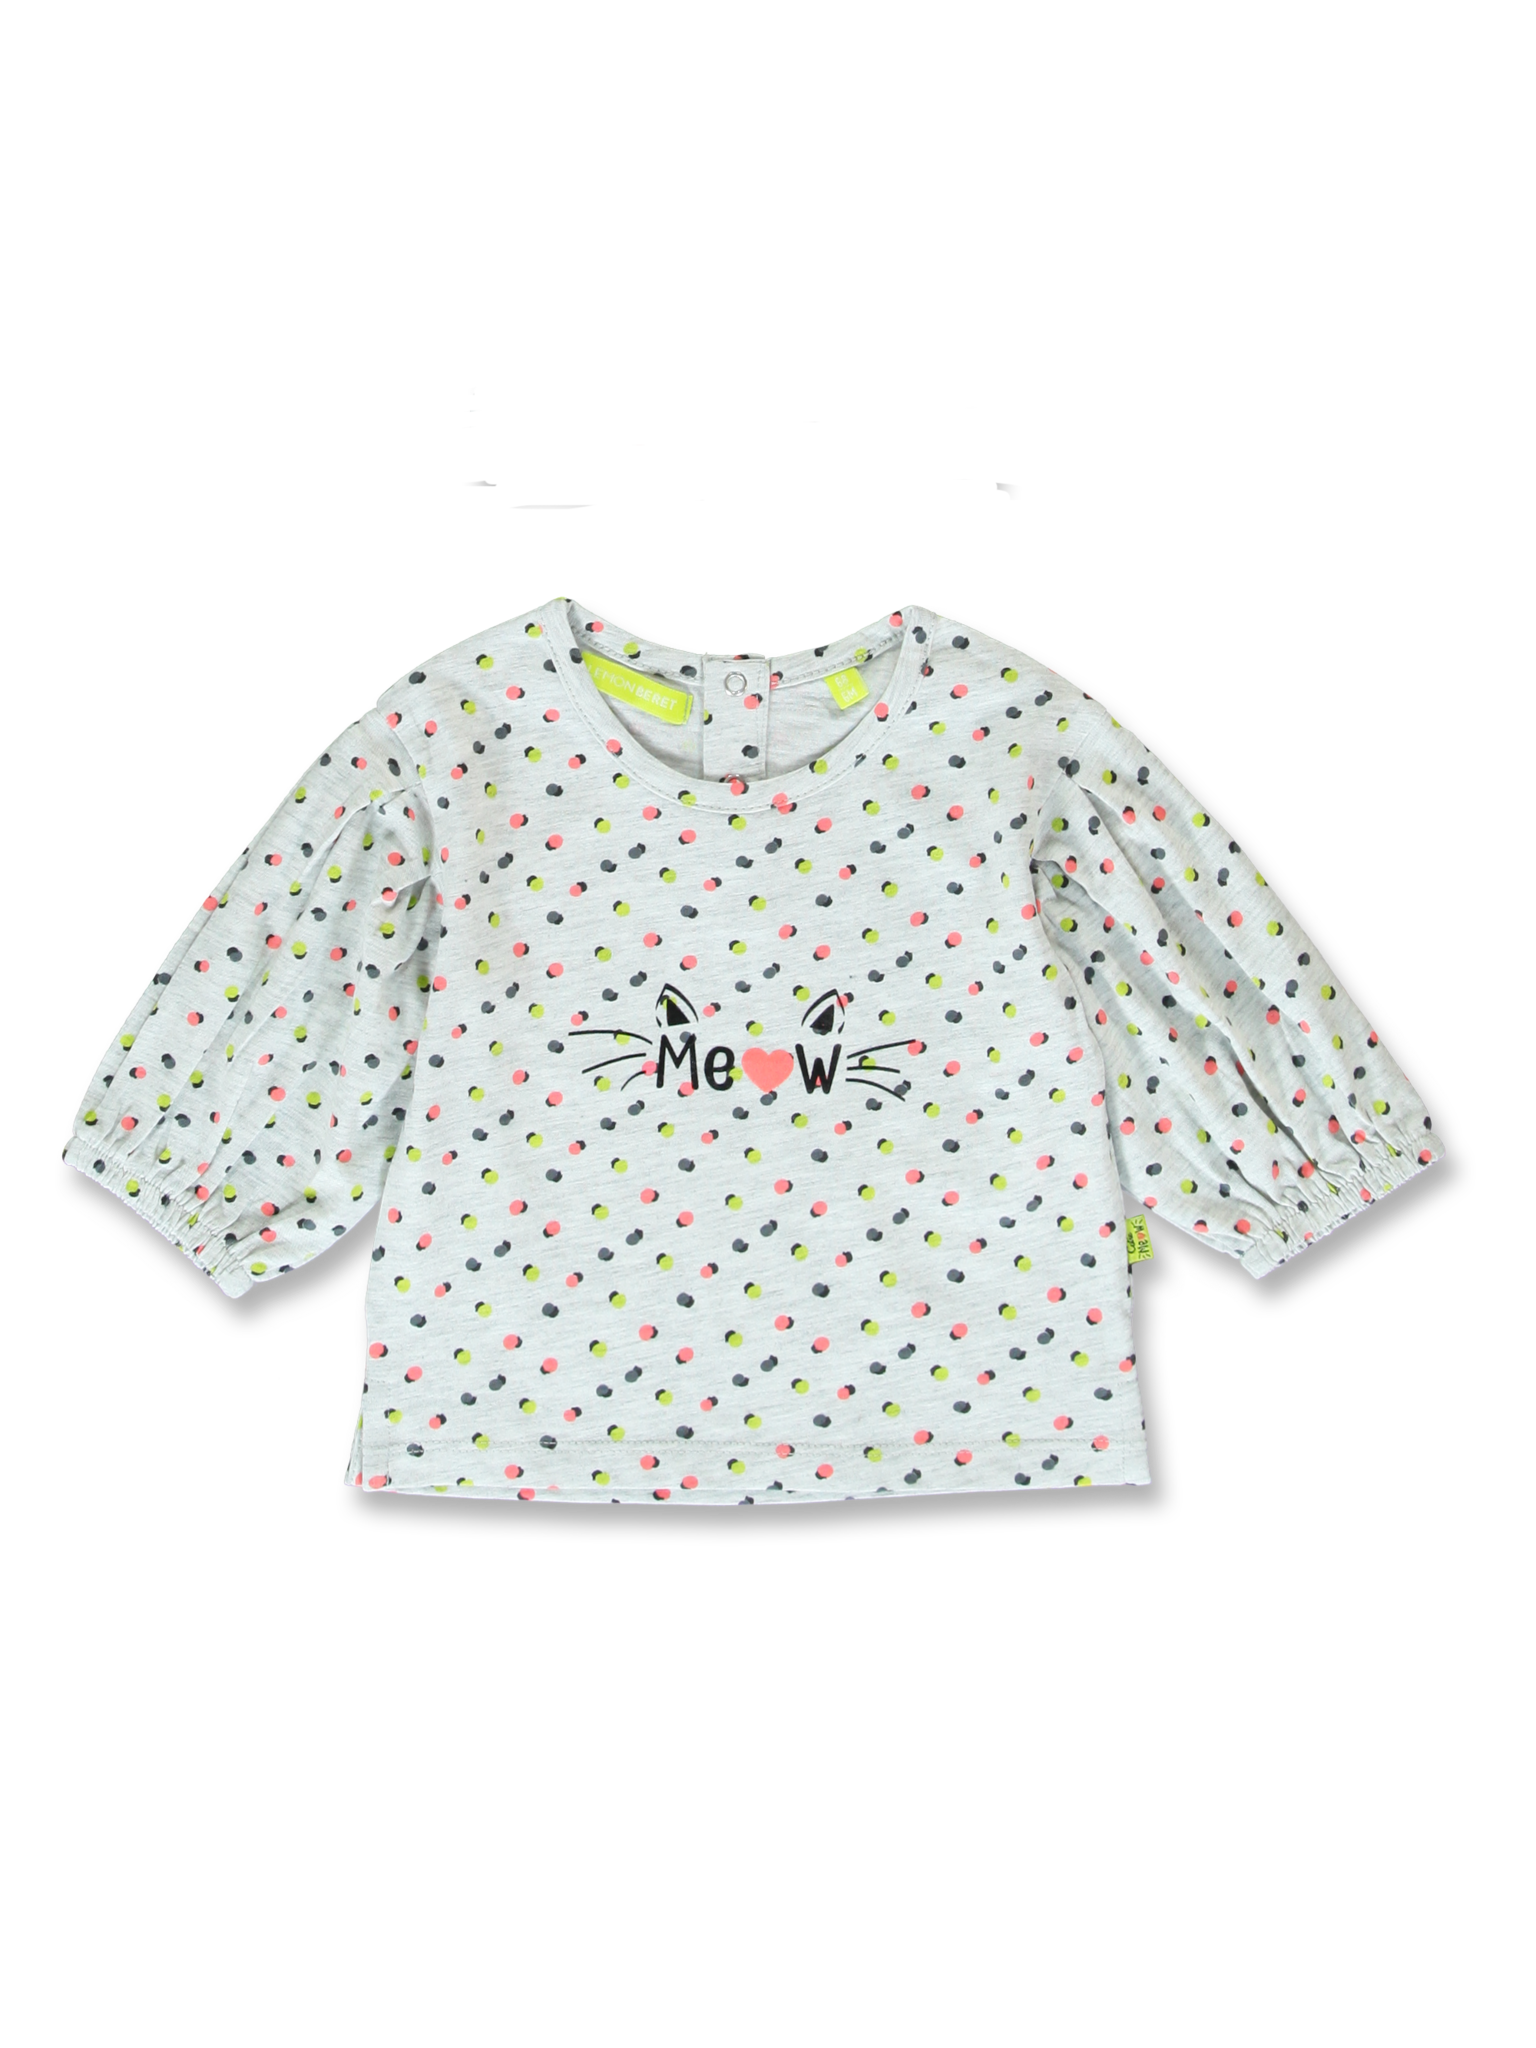 Lemon Beret   Winter 2019 Baby   T-shirt   8 pcs/box